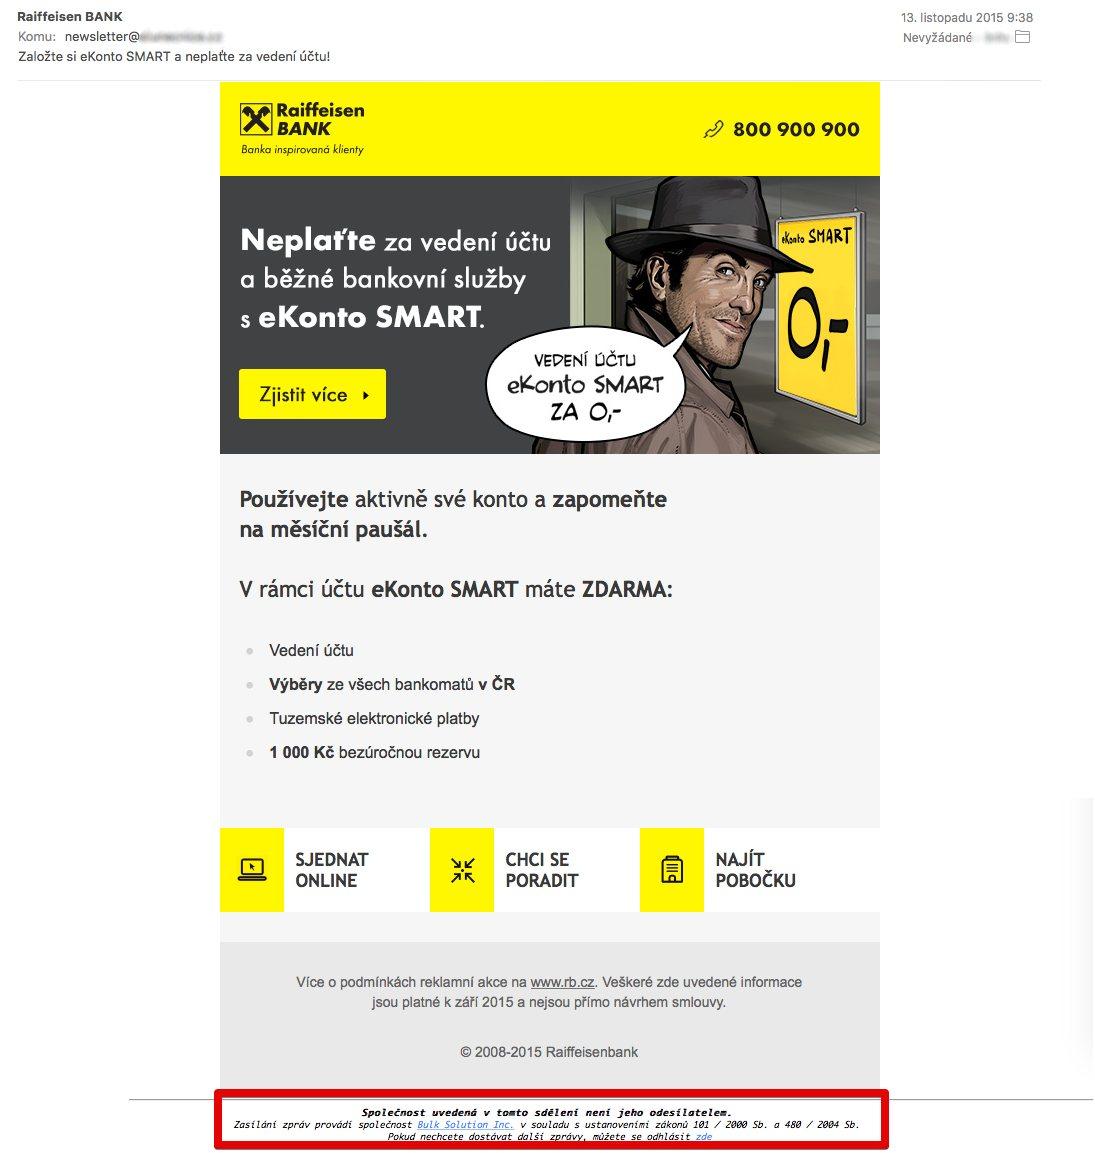 Raiffeisenbank spam